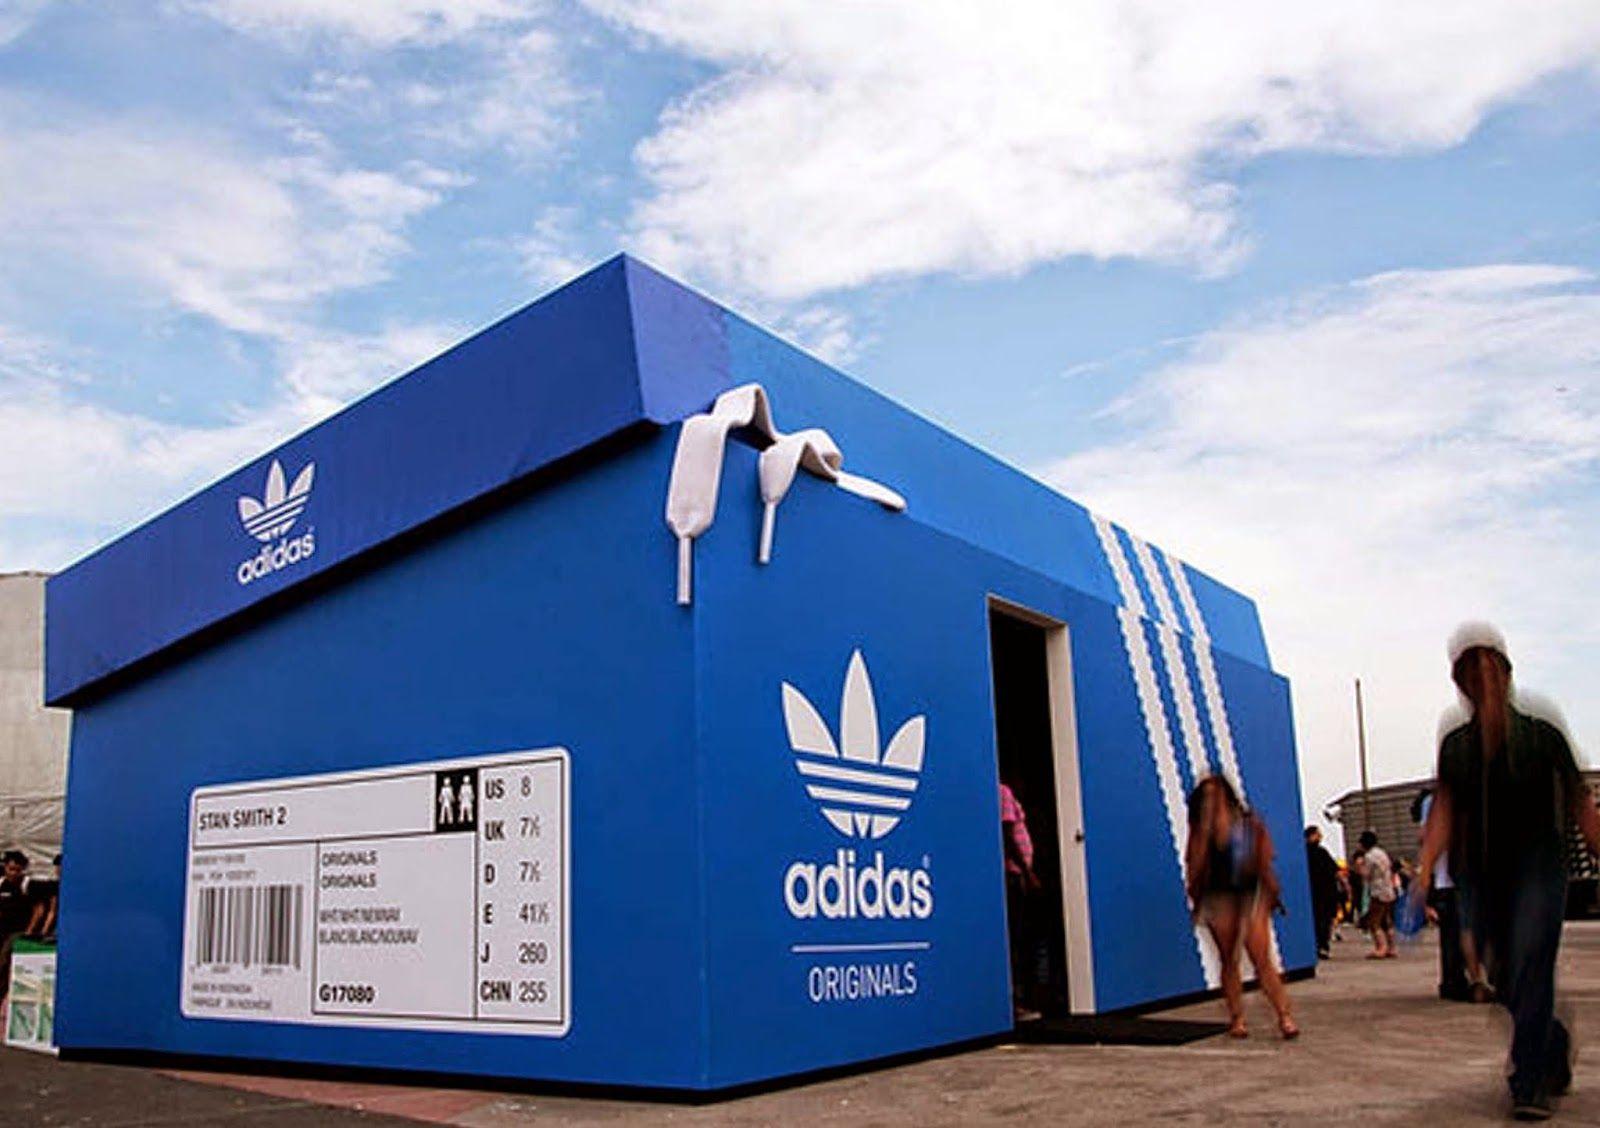 boutique adidas amsterdam,vente nike adidas amsterdam pas cher